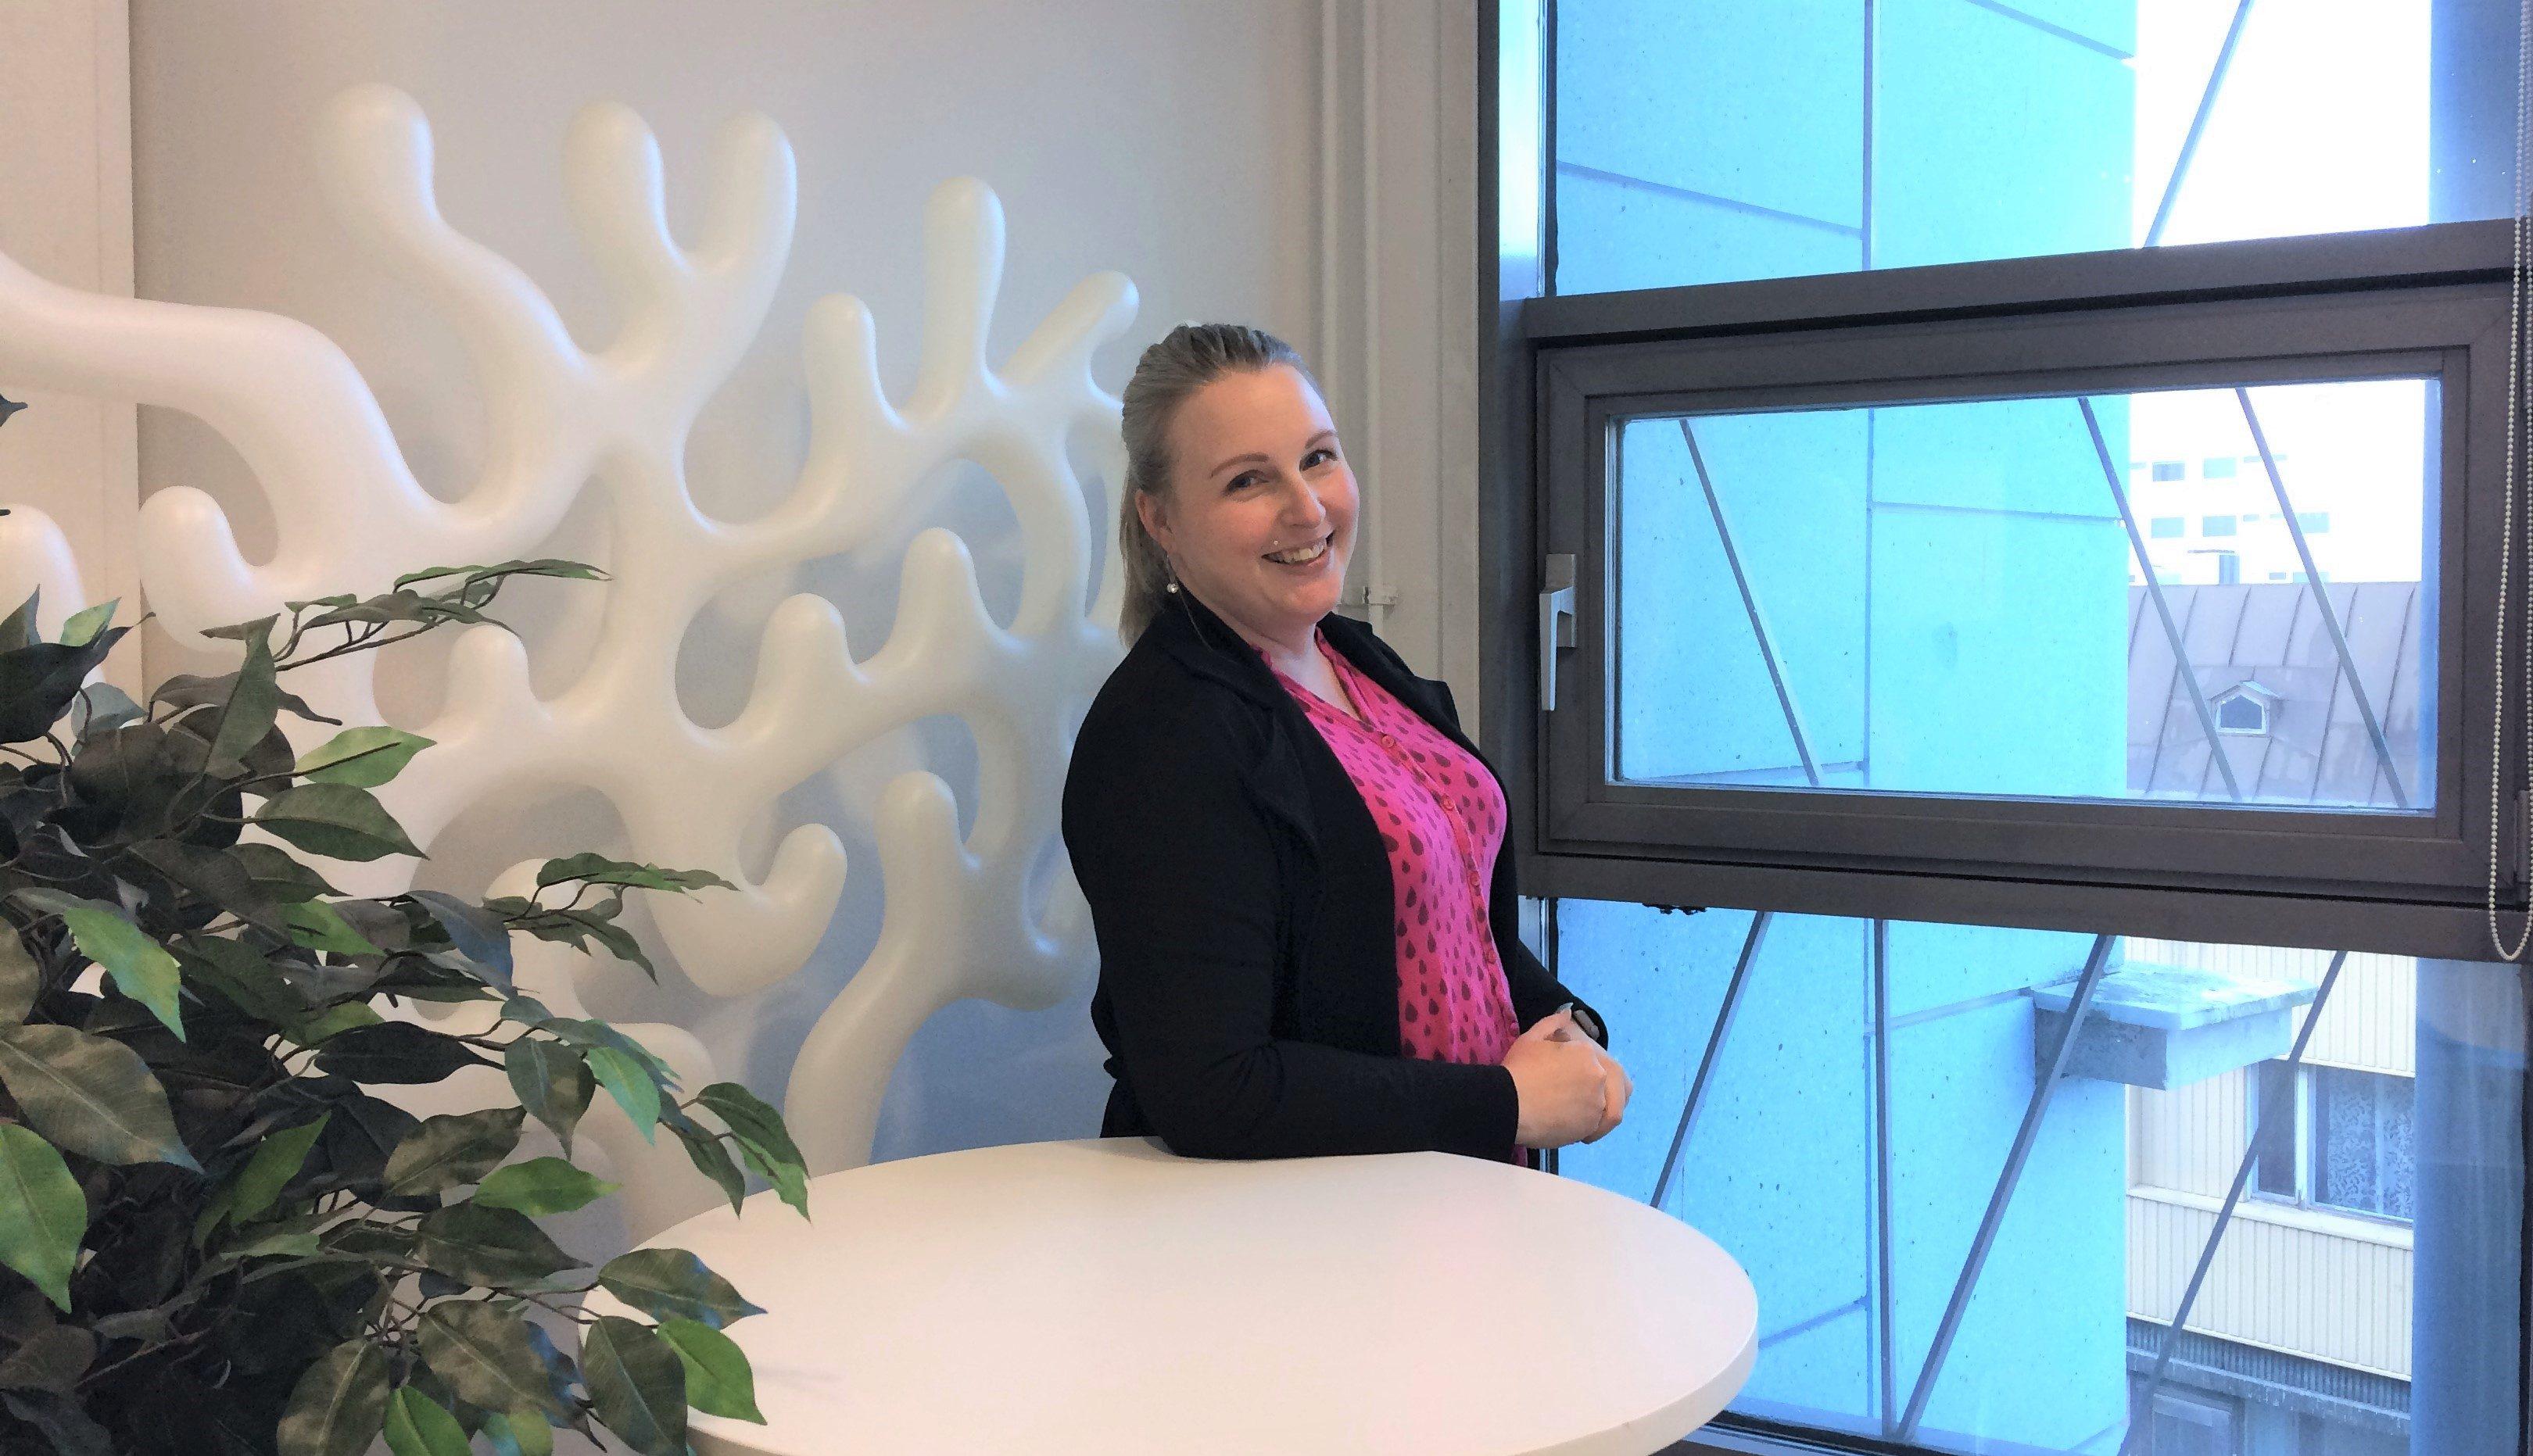 Elinar's Customer Service Officer Miia Sysilahti